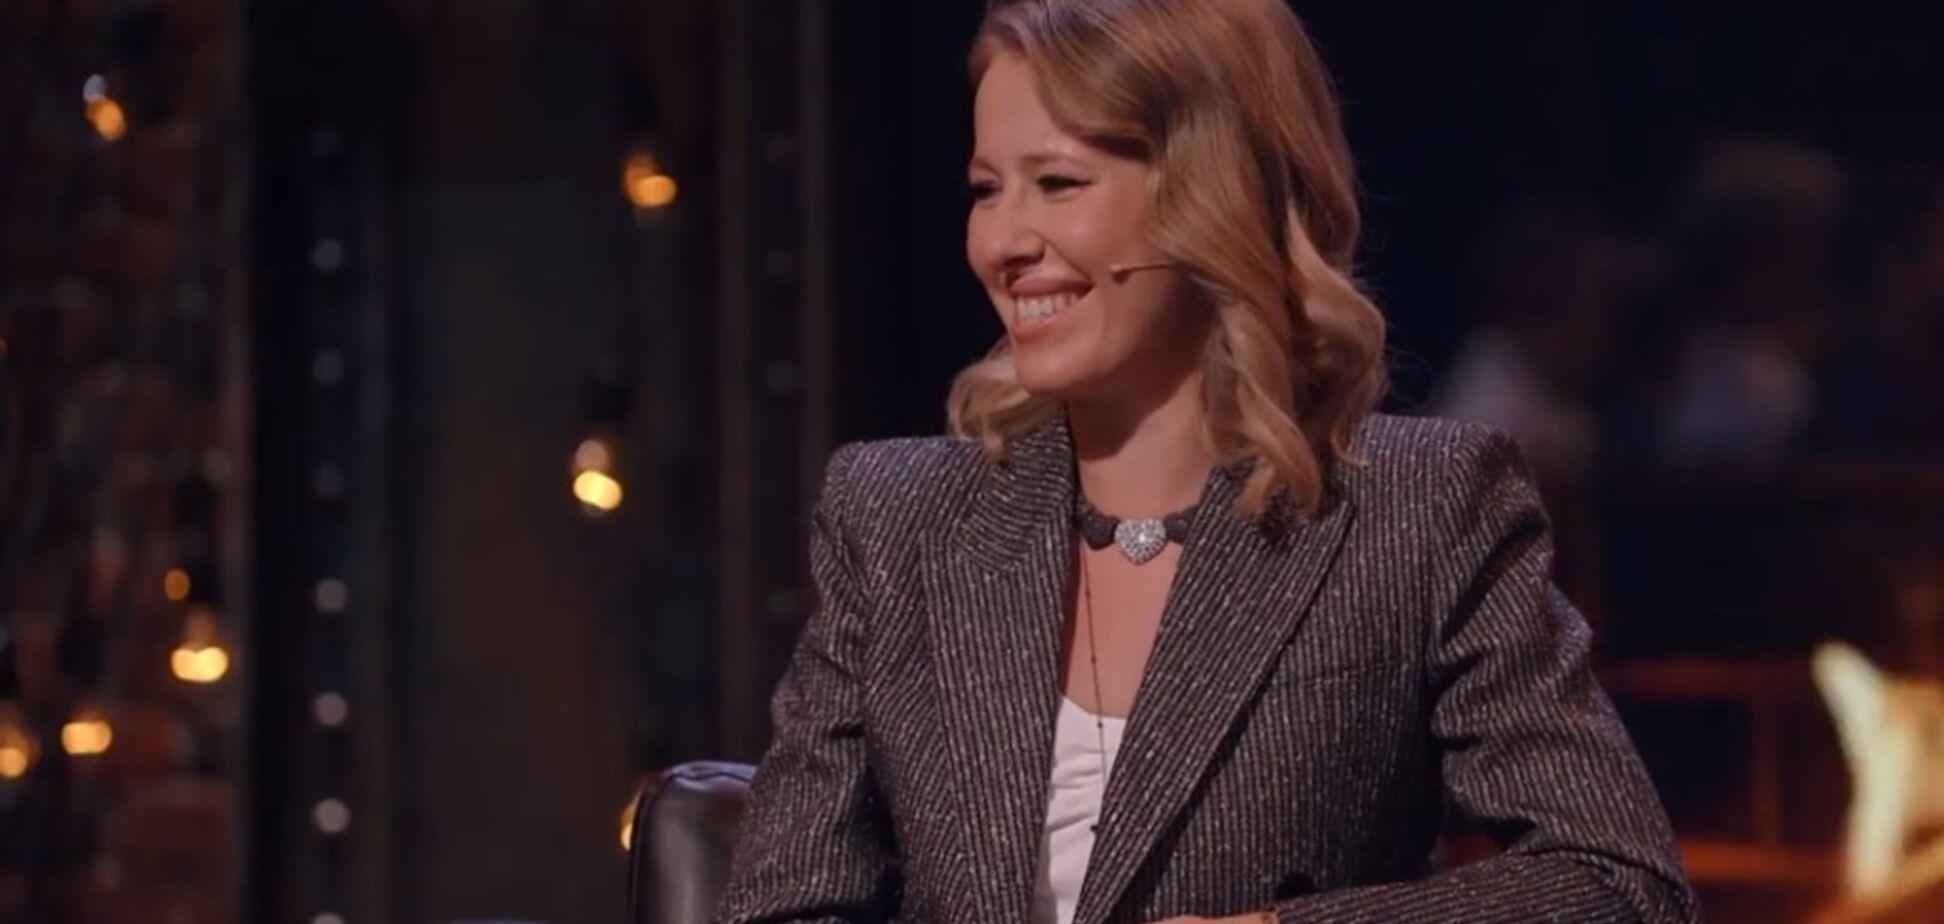 'Дам Шерон Стоун': Собчак раздвинула ноги на росТВ